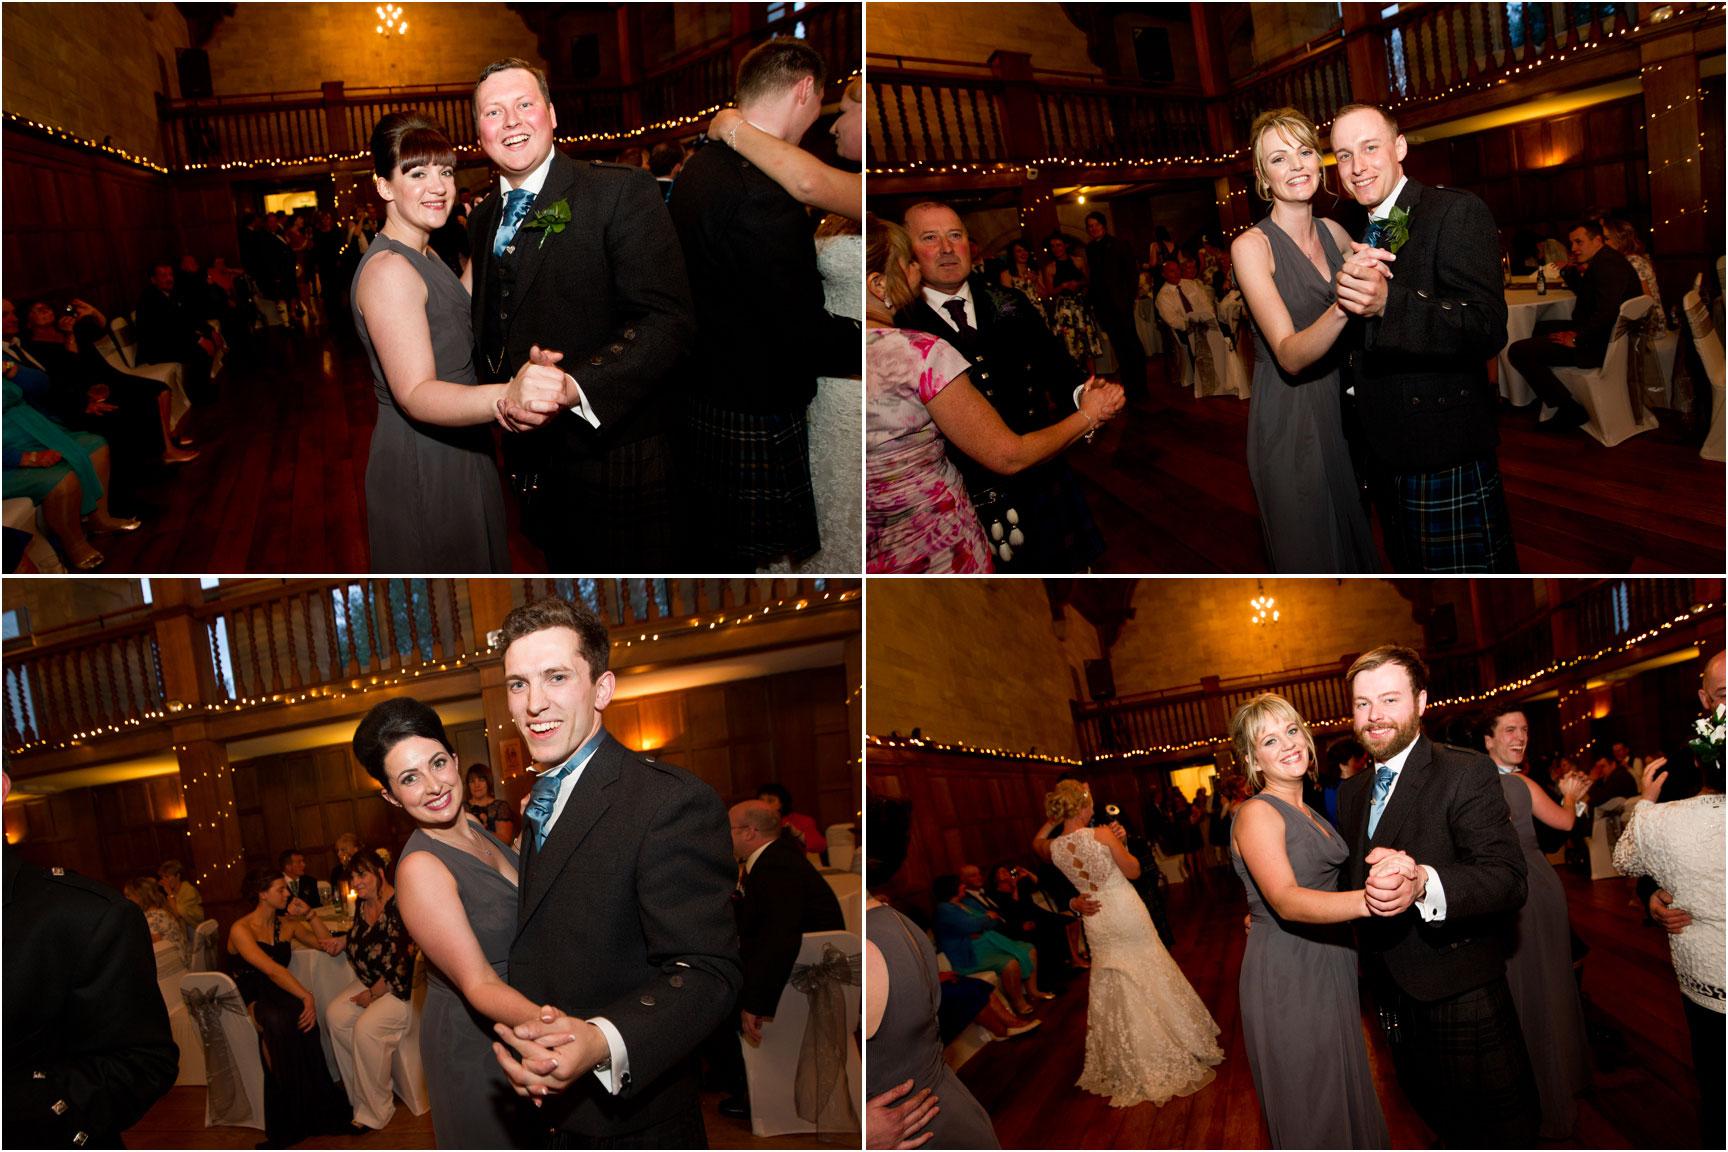 scottish-wedding-dance